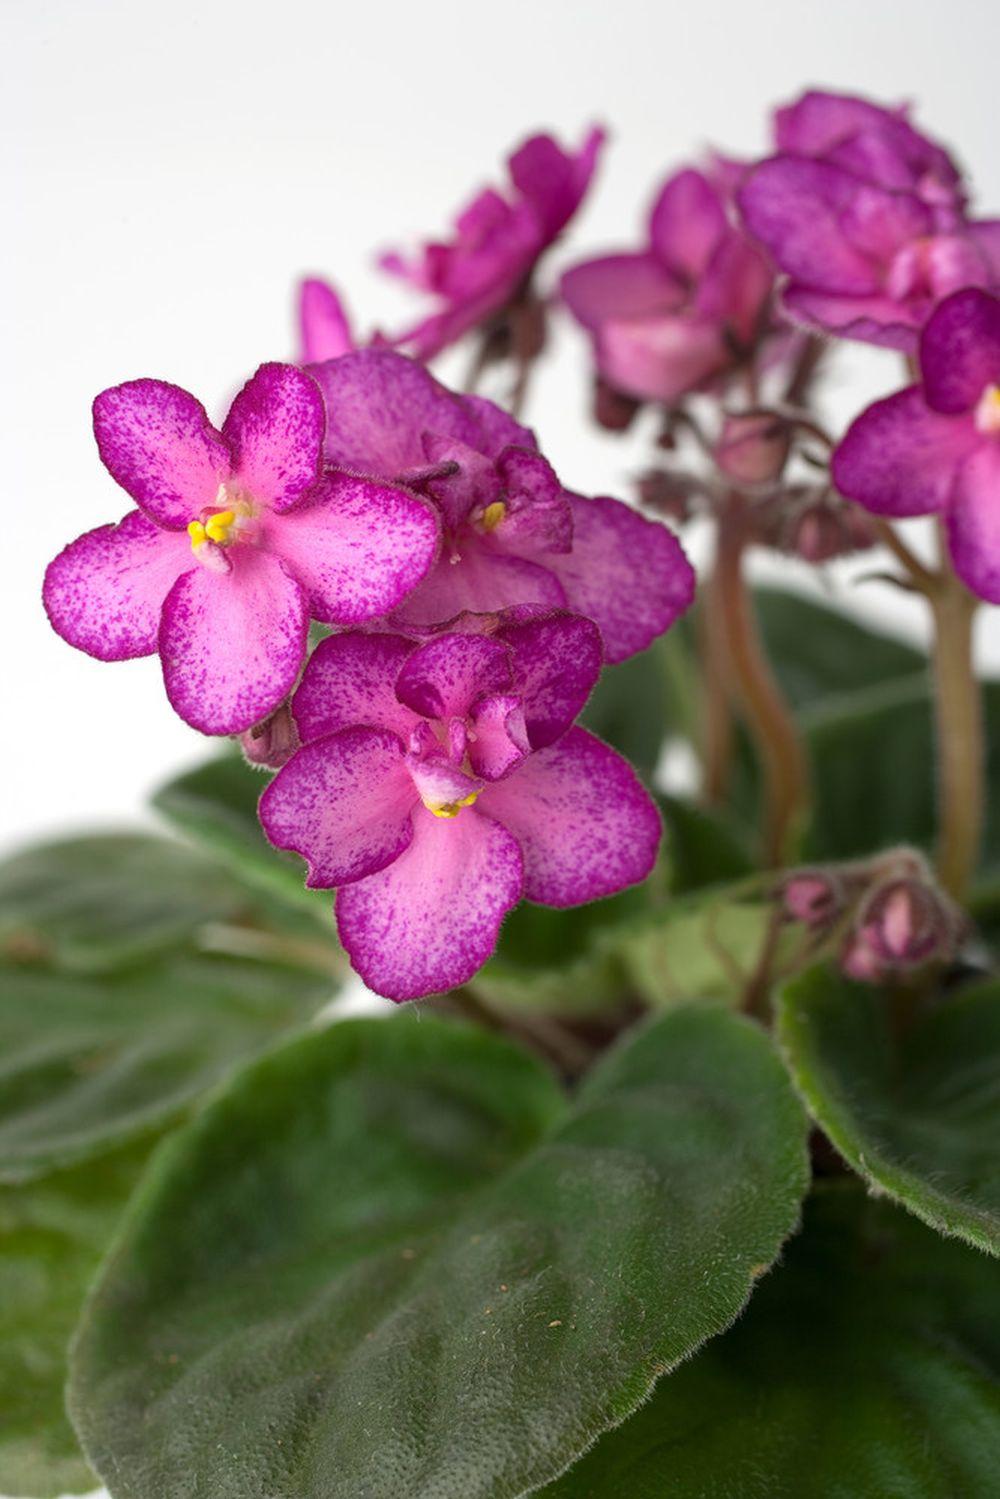 adelaparvu.com despre violetele de Parma, Saintpaulia, Text Carli Marian, Foto Floradania (6)